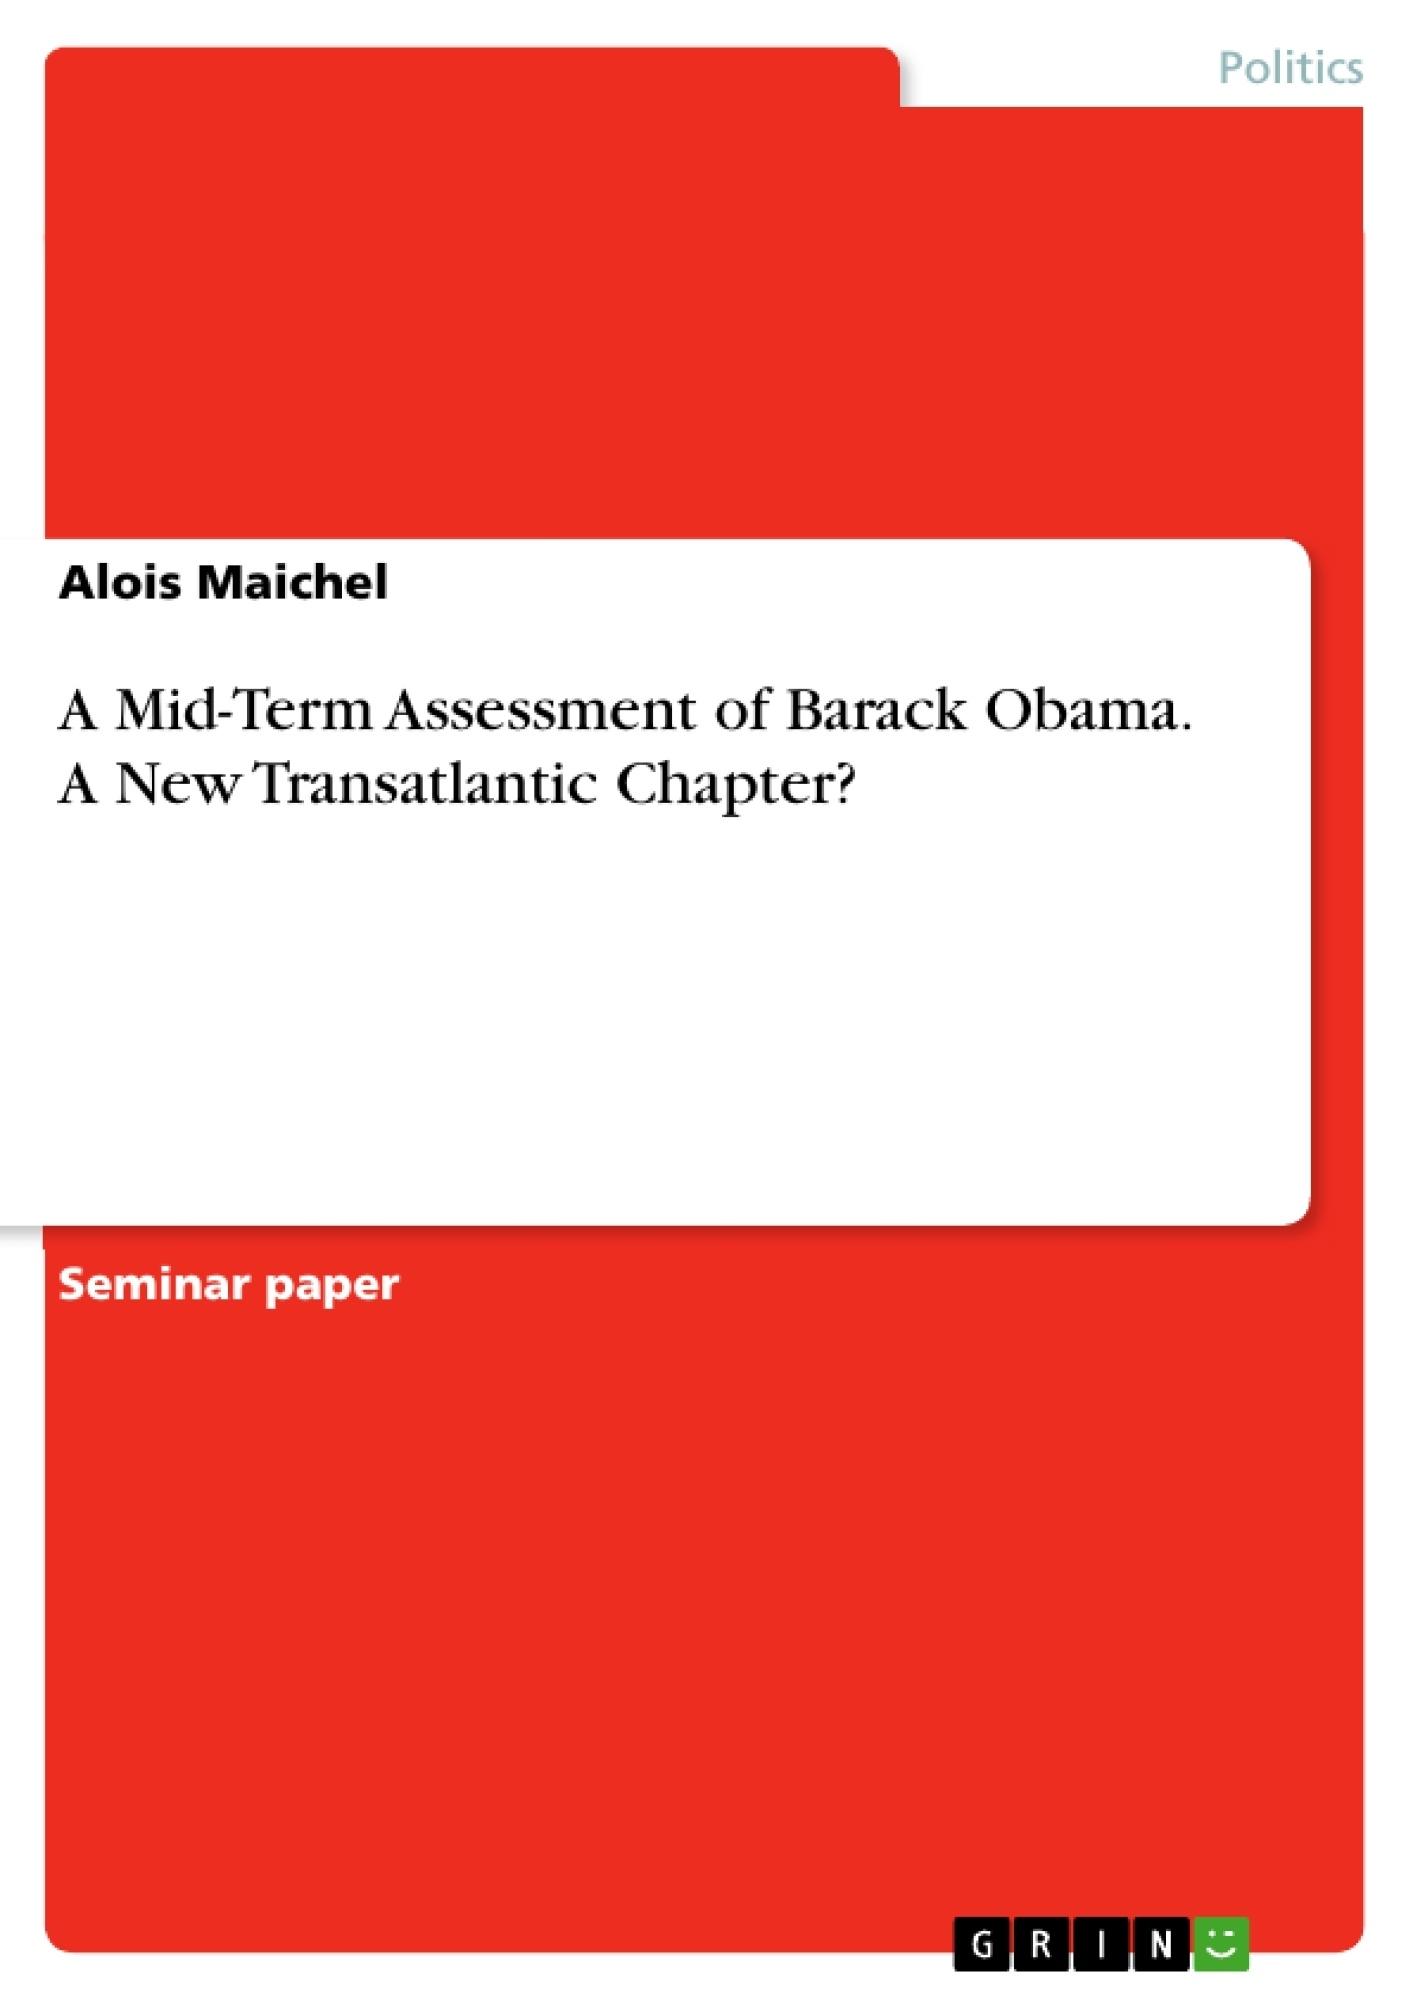 Title: A Mid-Term Assessment of Barack Obama. A New Transatlantic Chapter?